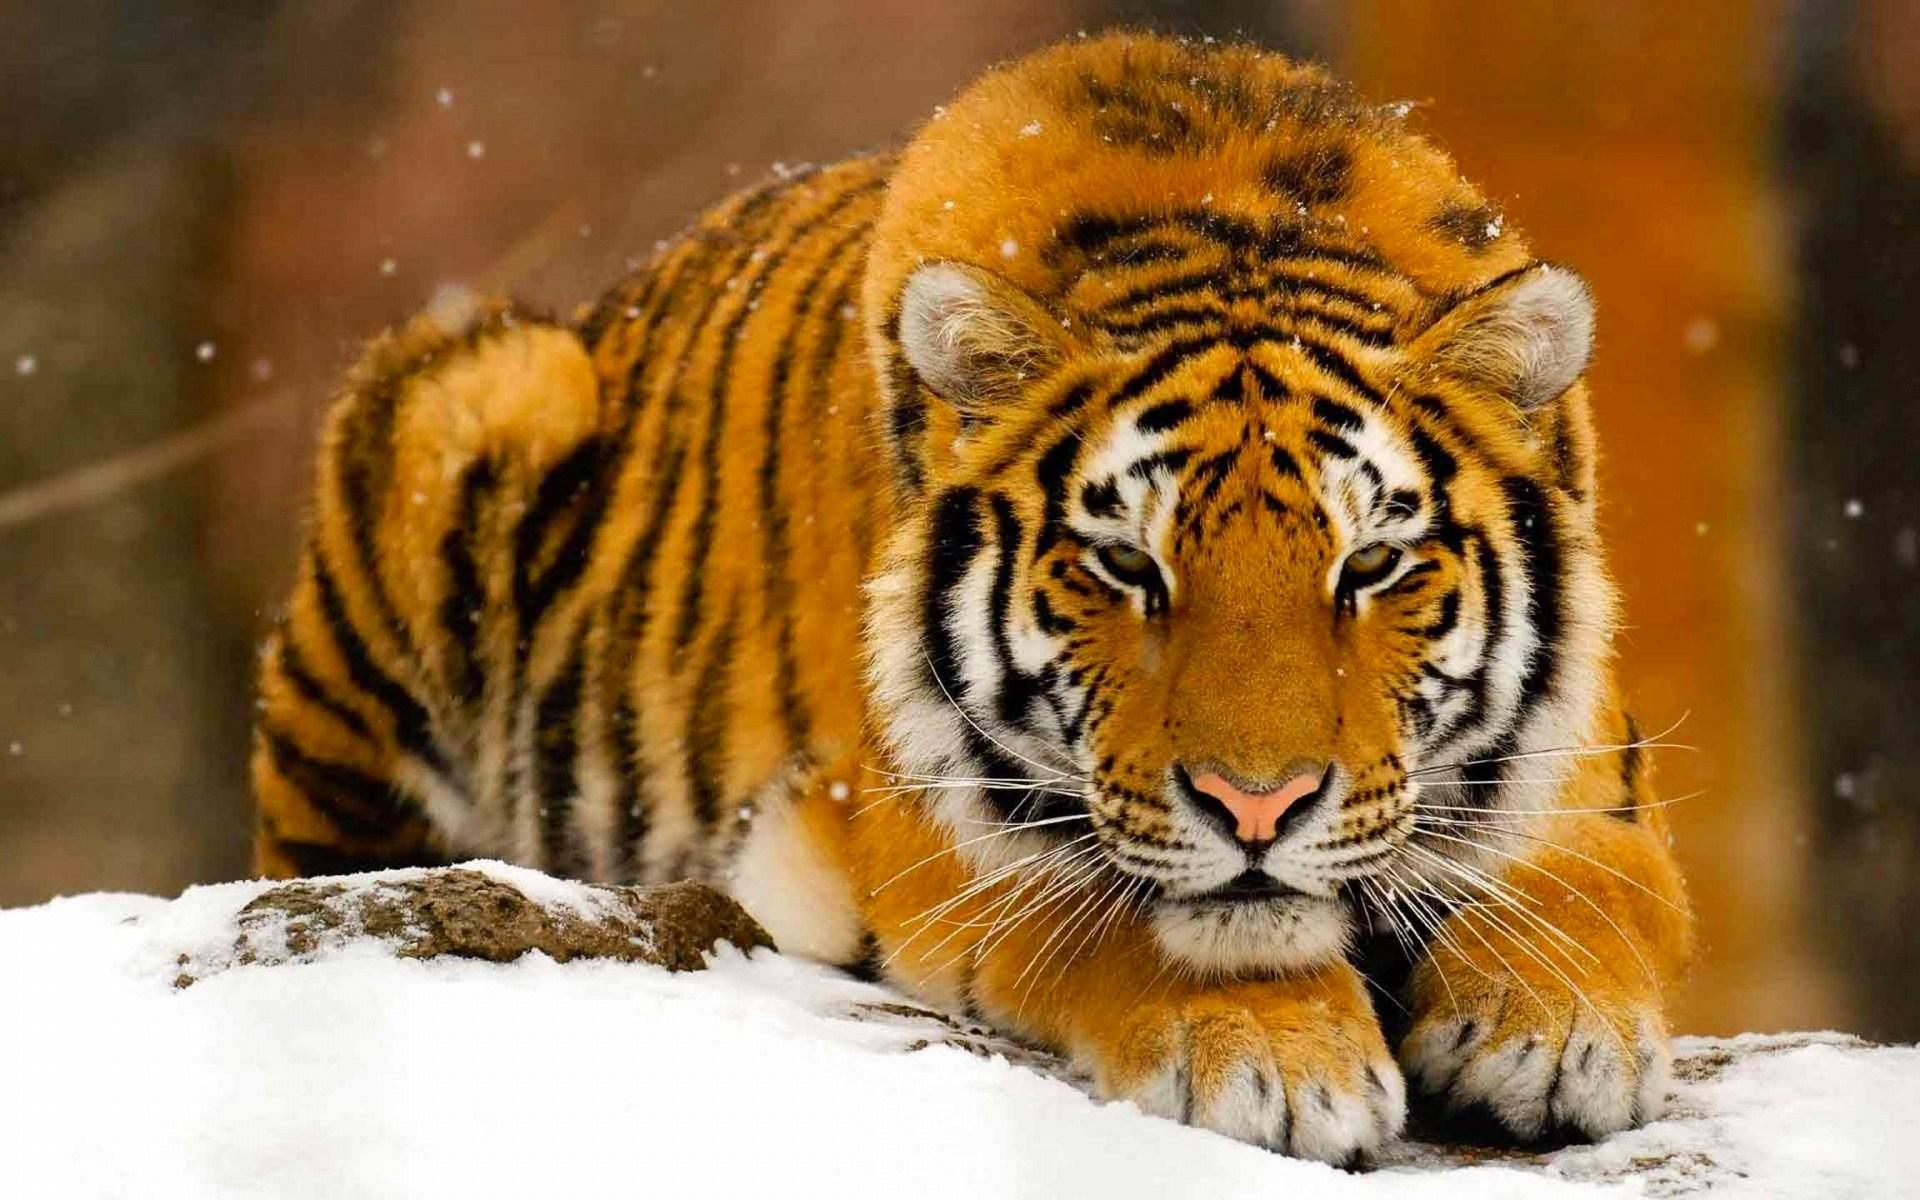 Image tigre des neiges - tigre, tigres, félin, félins, neige